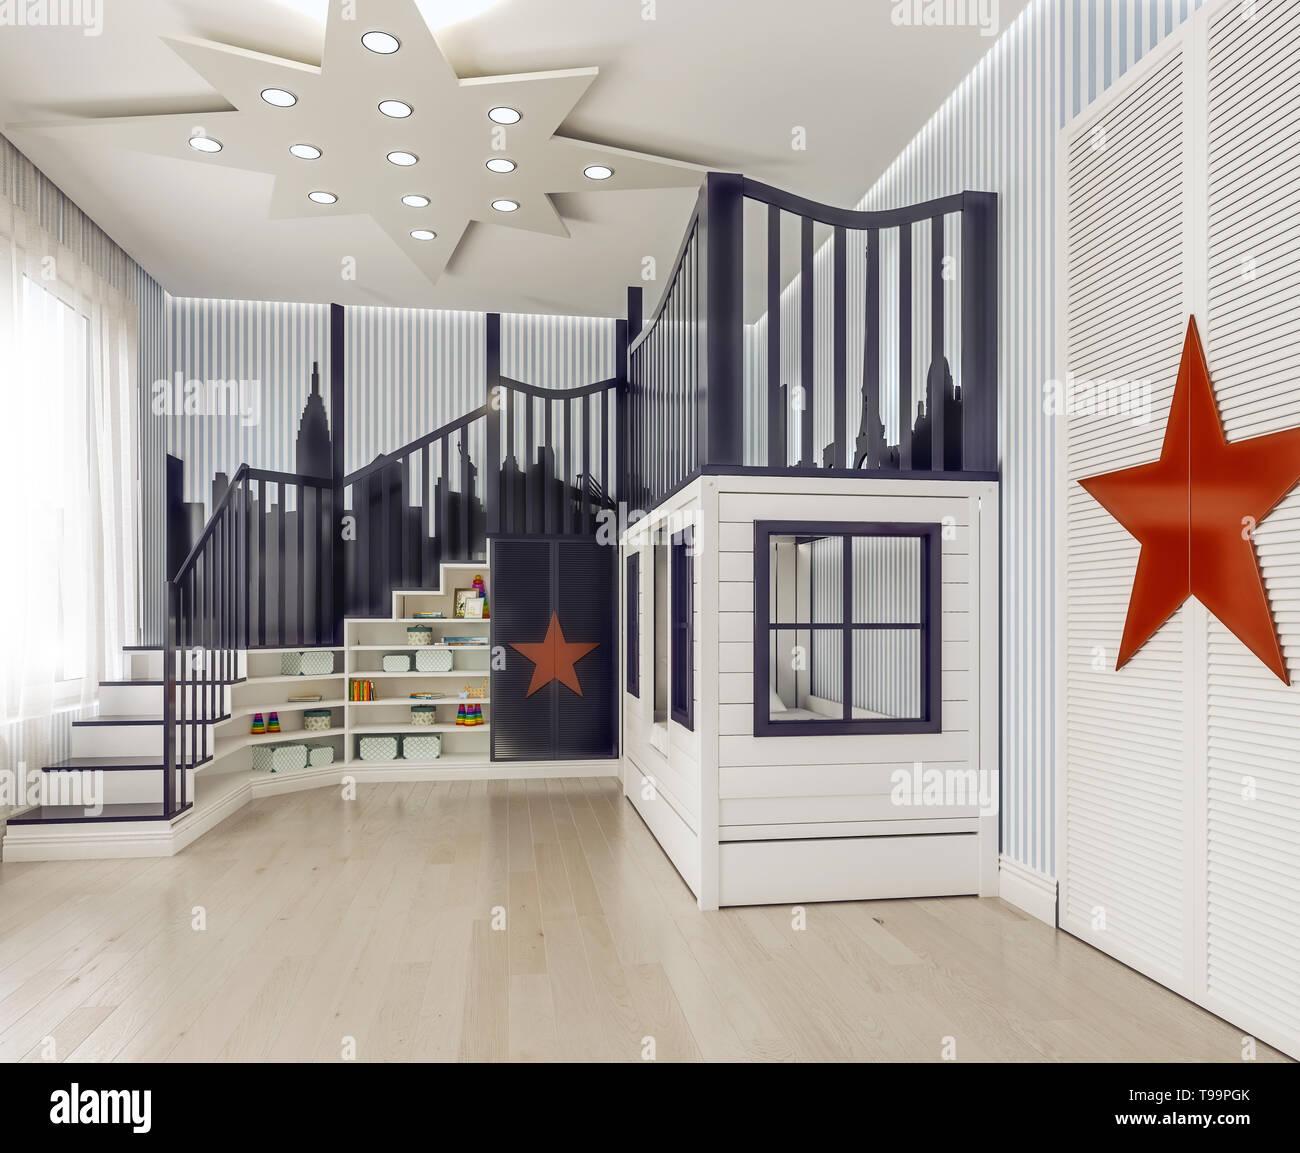 Modernes Interieur Kinder Schlafzimmer, Kinderzimmer ...